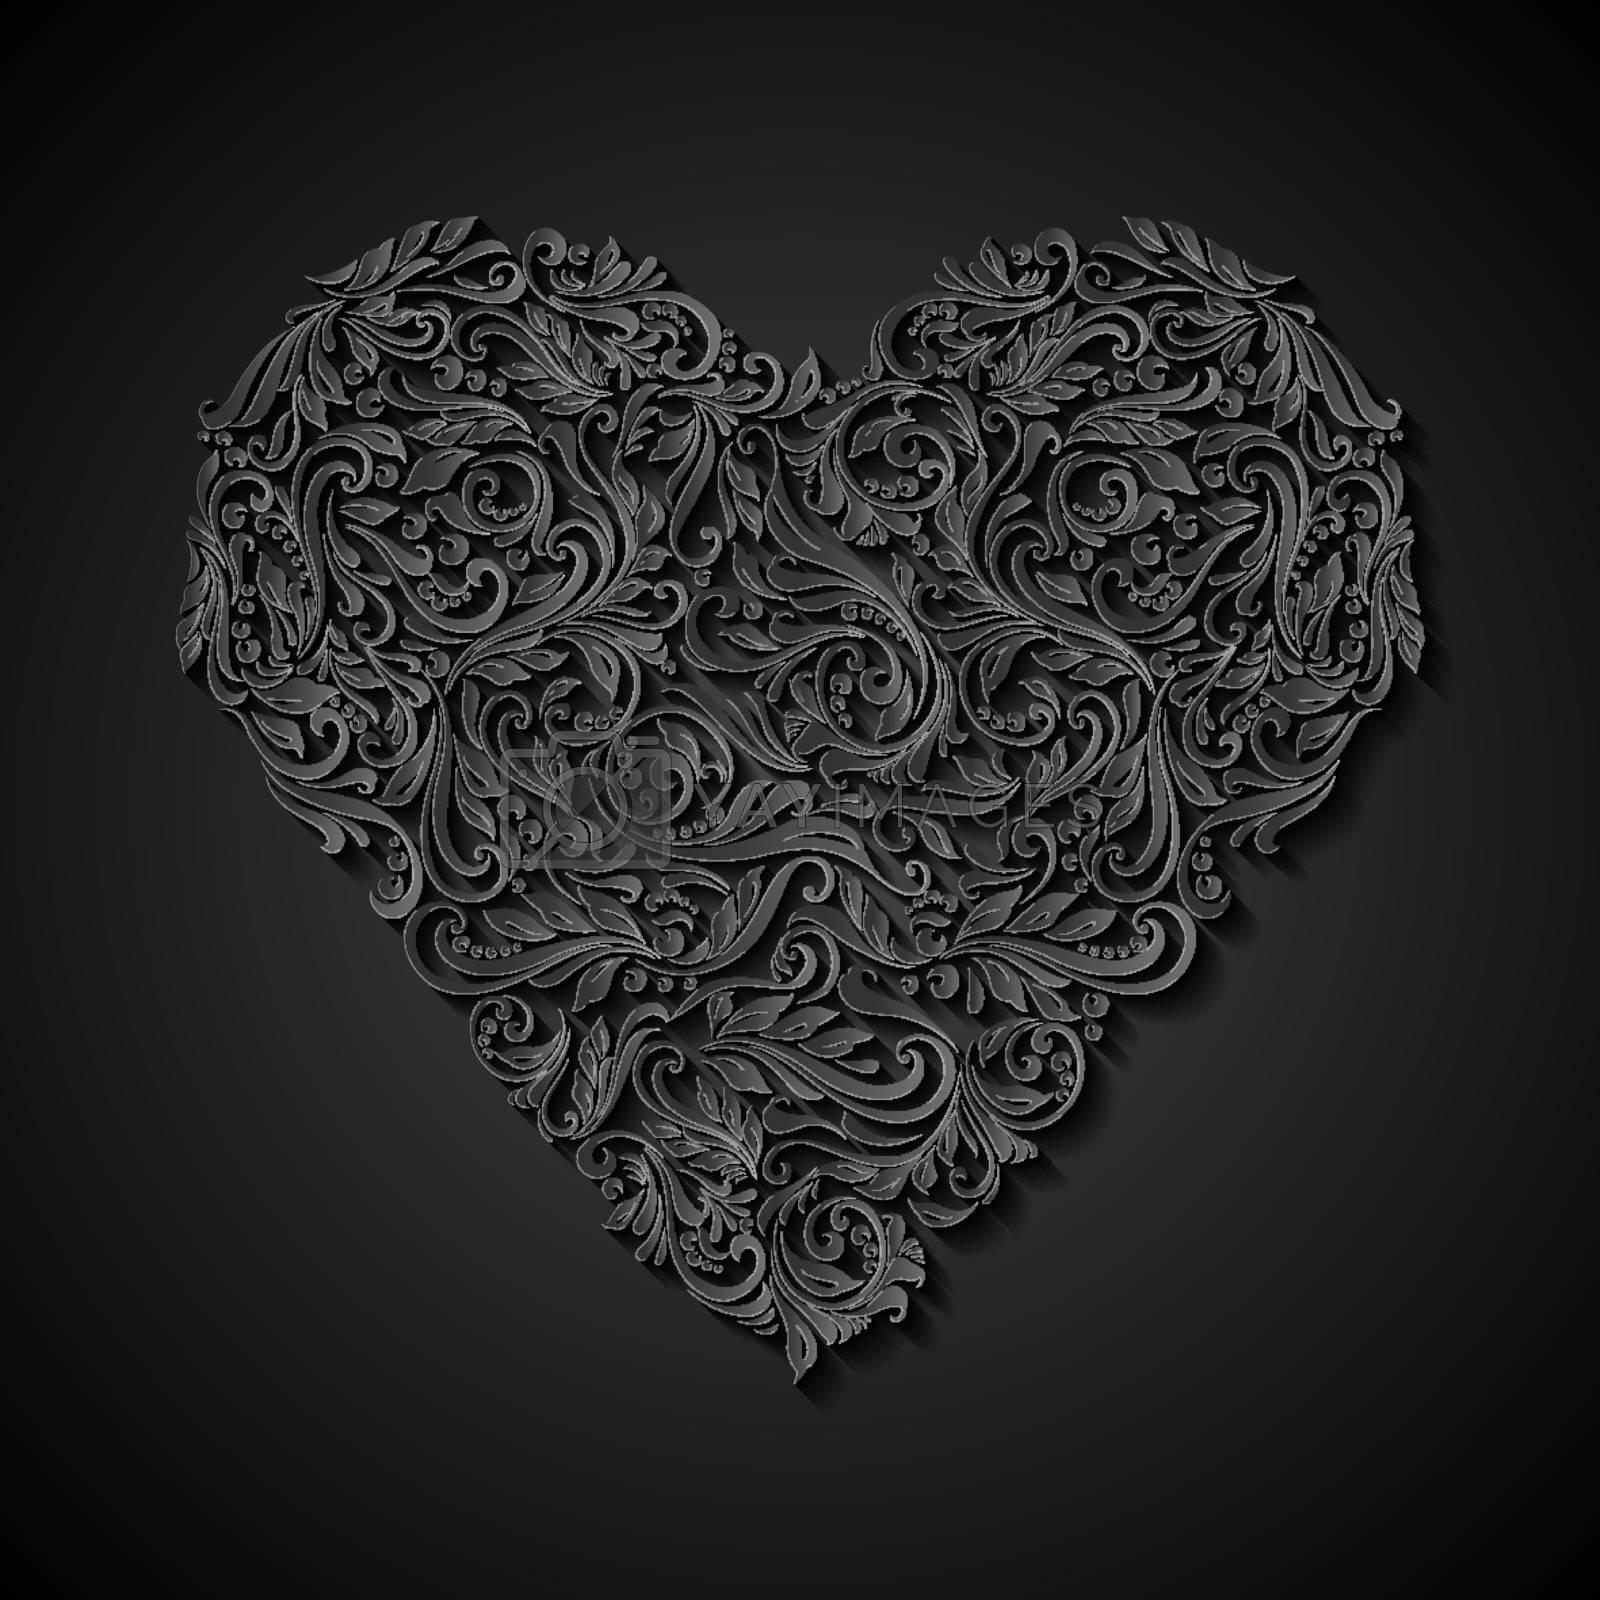 Decorative heart of the rich ornament in black